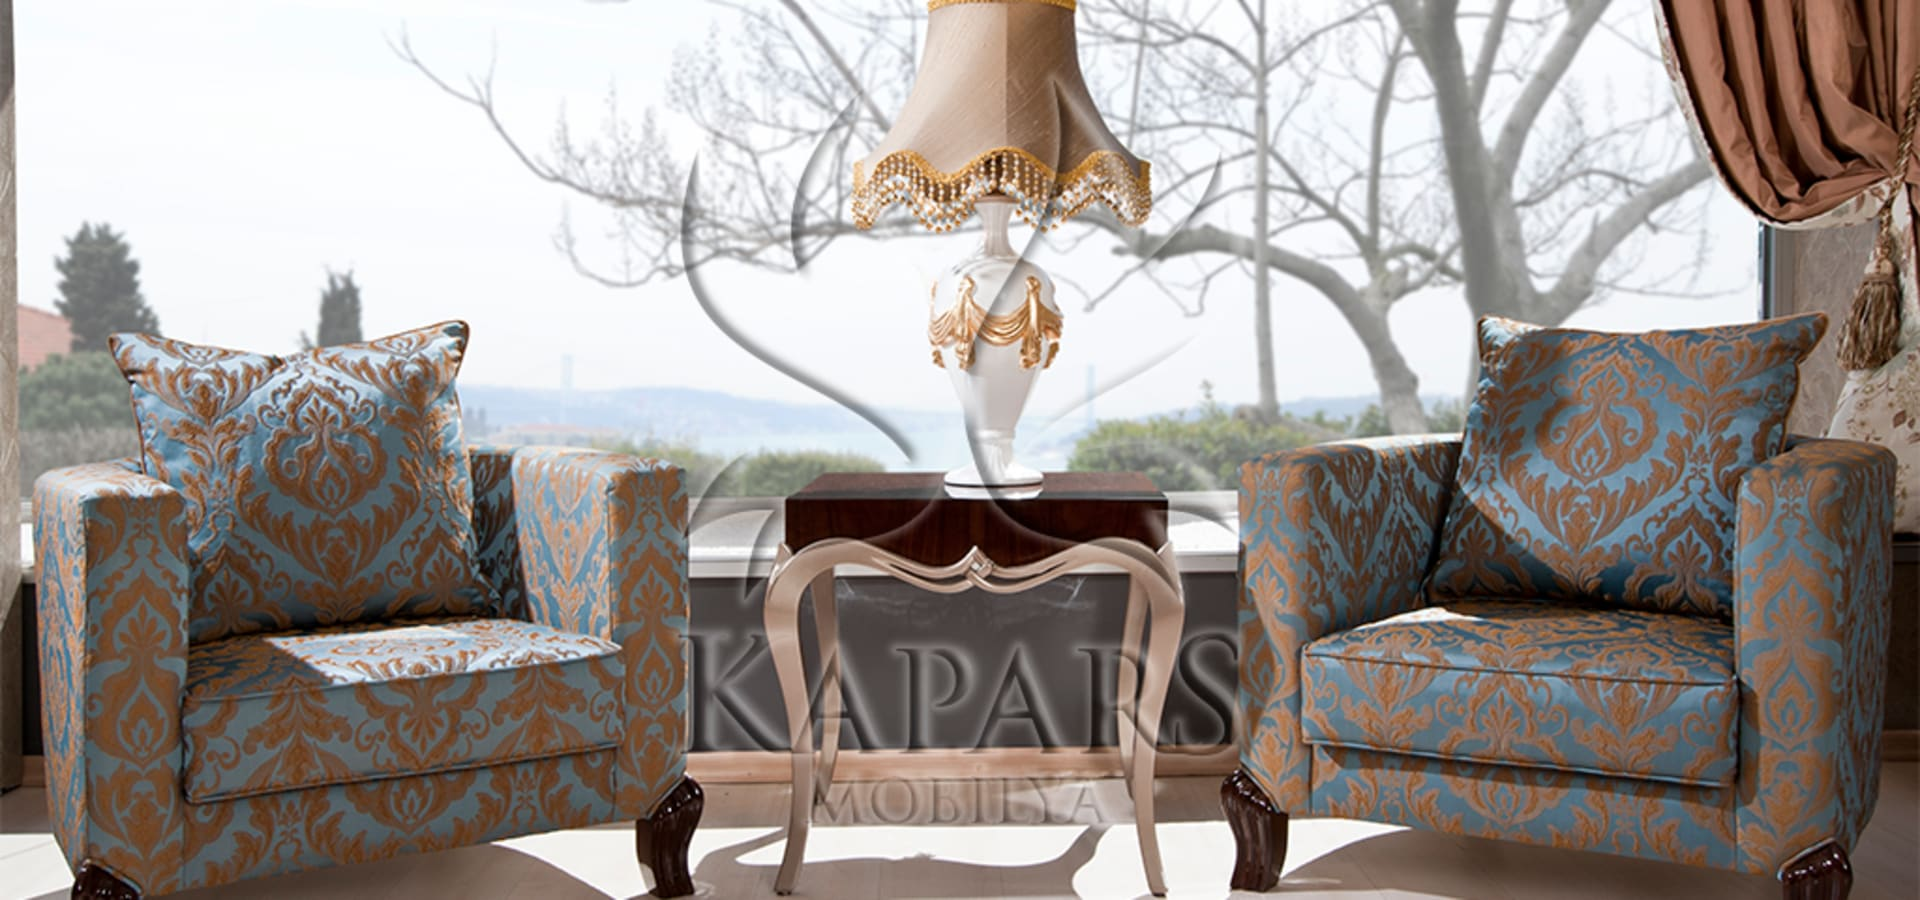 Kapars Mobilya & Dekorasyon